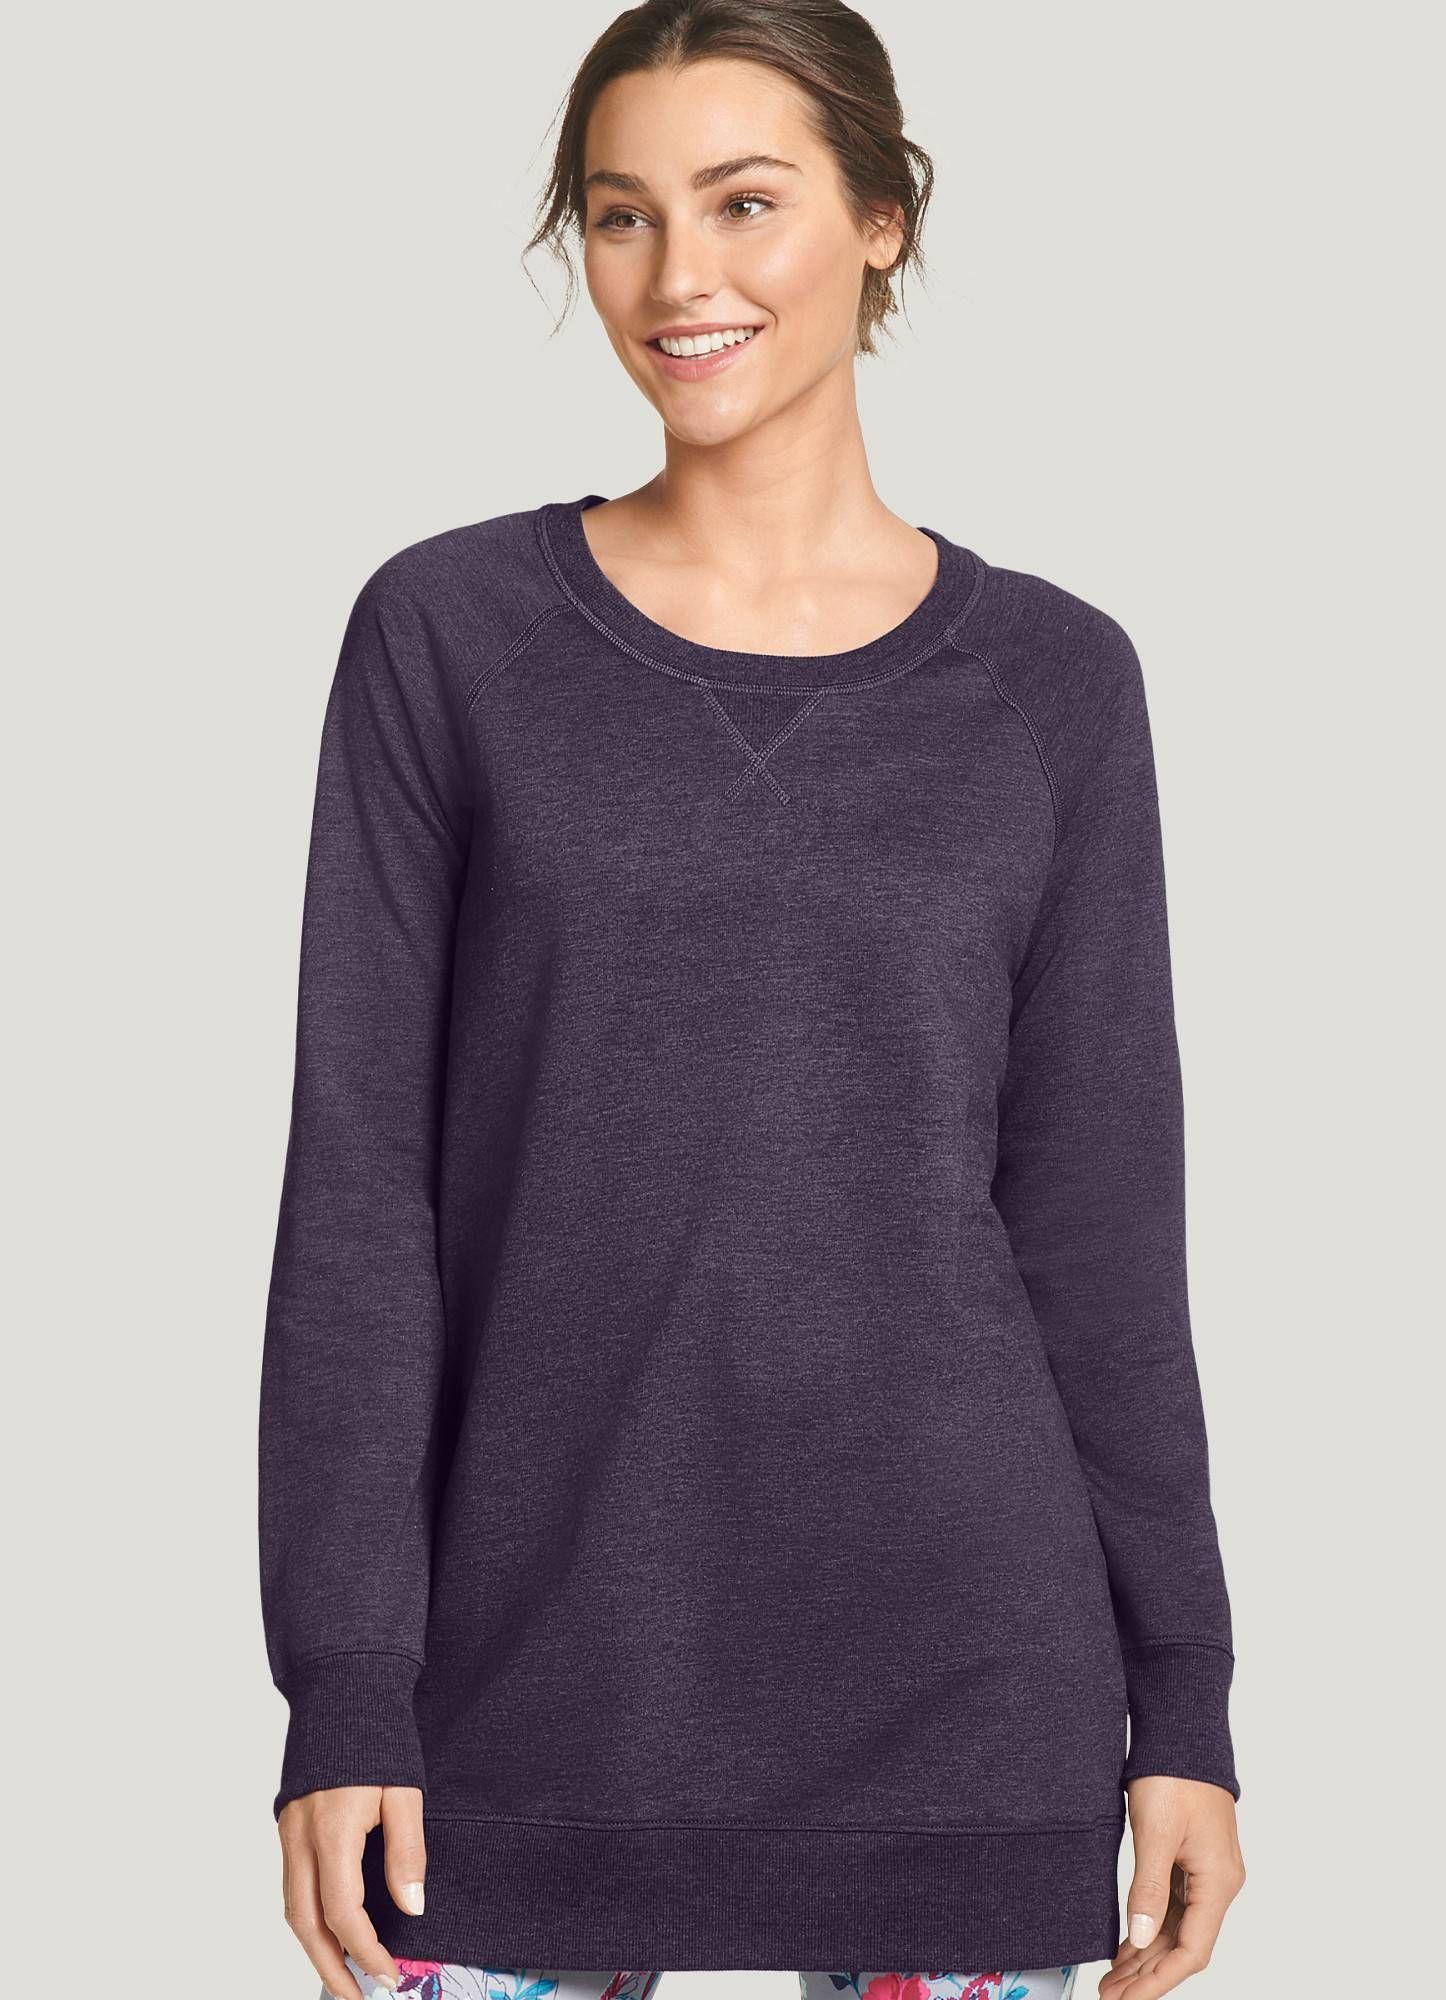 Jockey Sweatshirt Tunic Venetian Purple Heather S Sweatshirts Women Tunic Sweatshirt Sweatshirts [ 2000 x 1446 Pixel ]